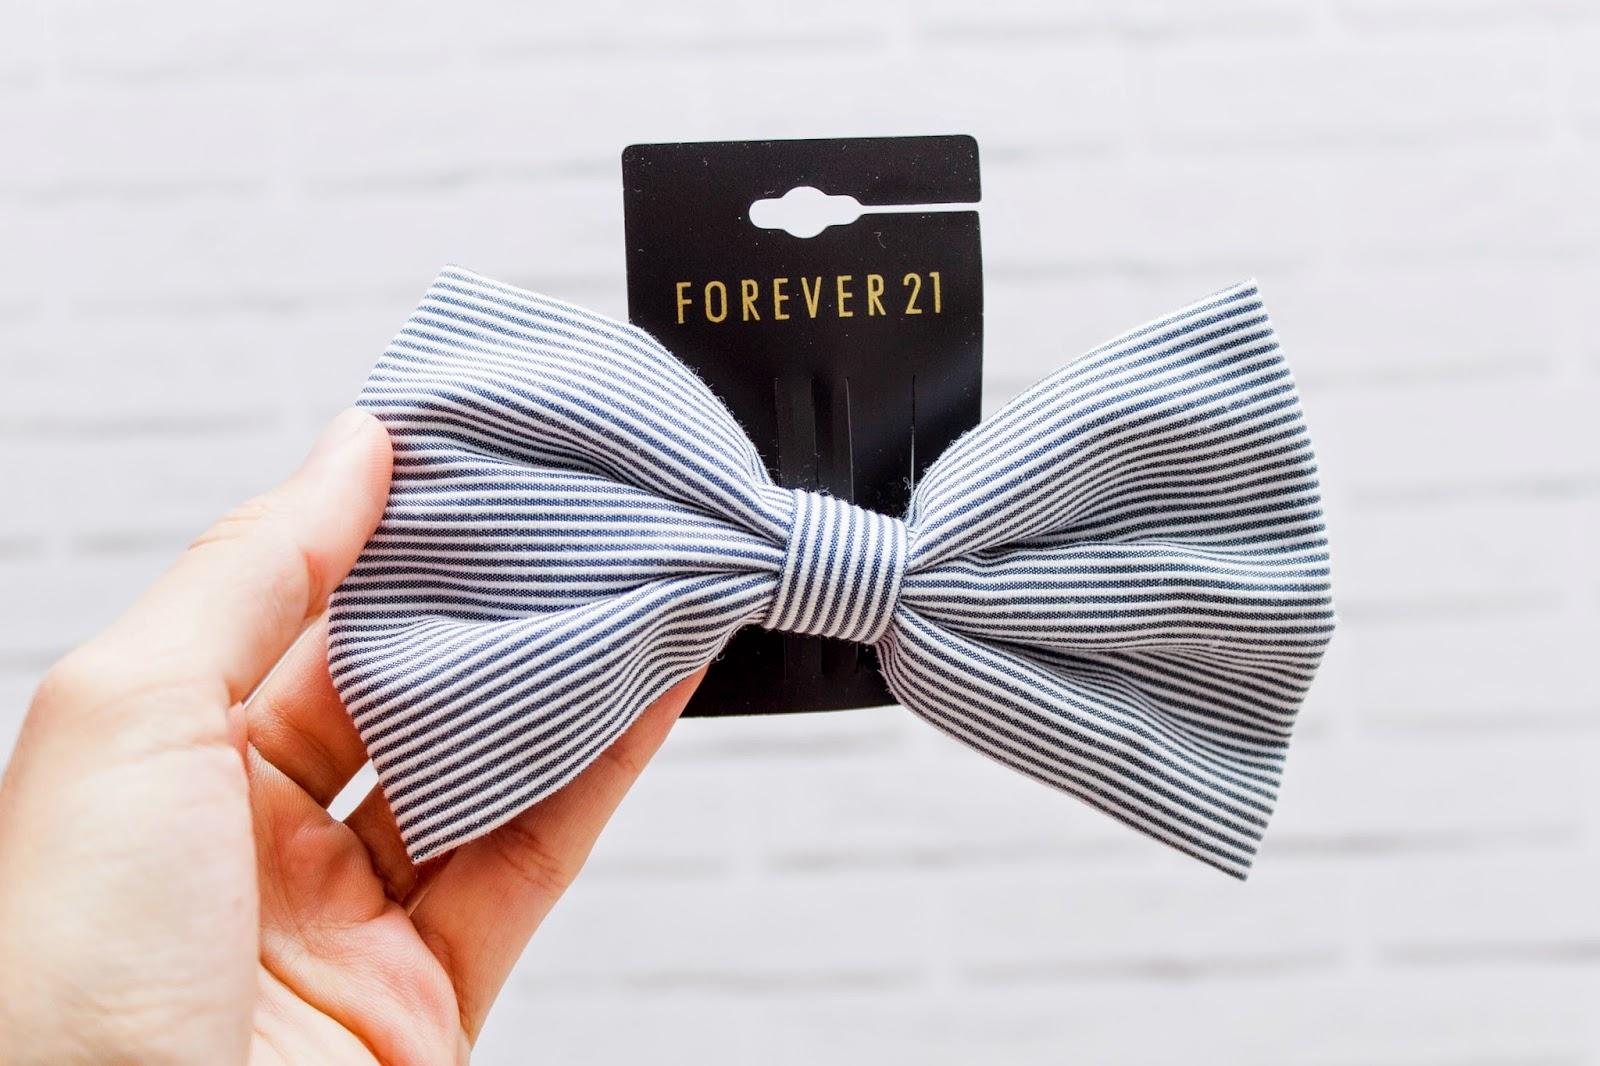 Compras Na Forever 21